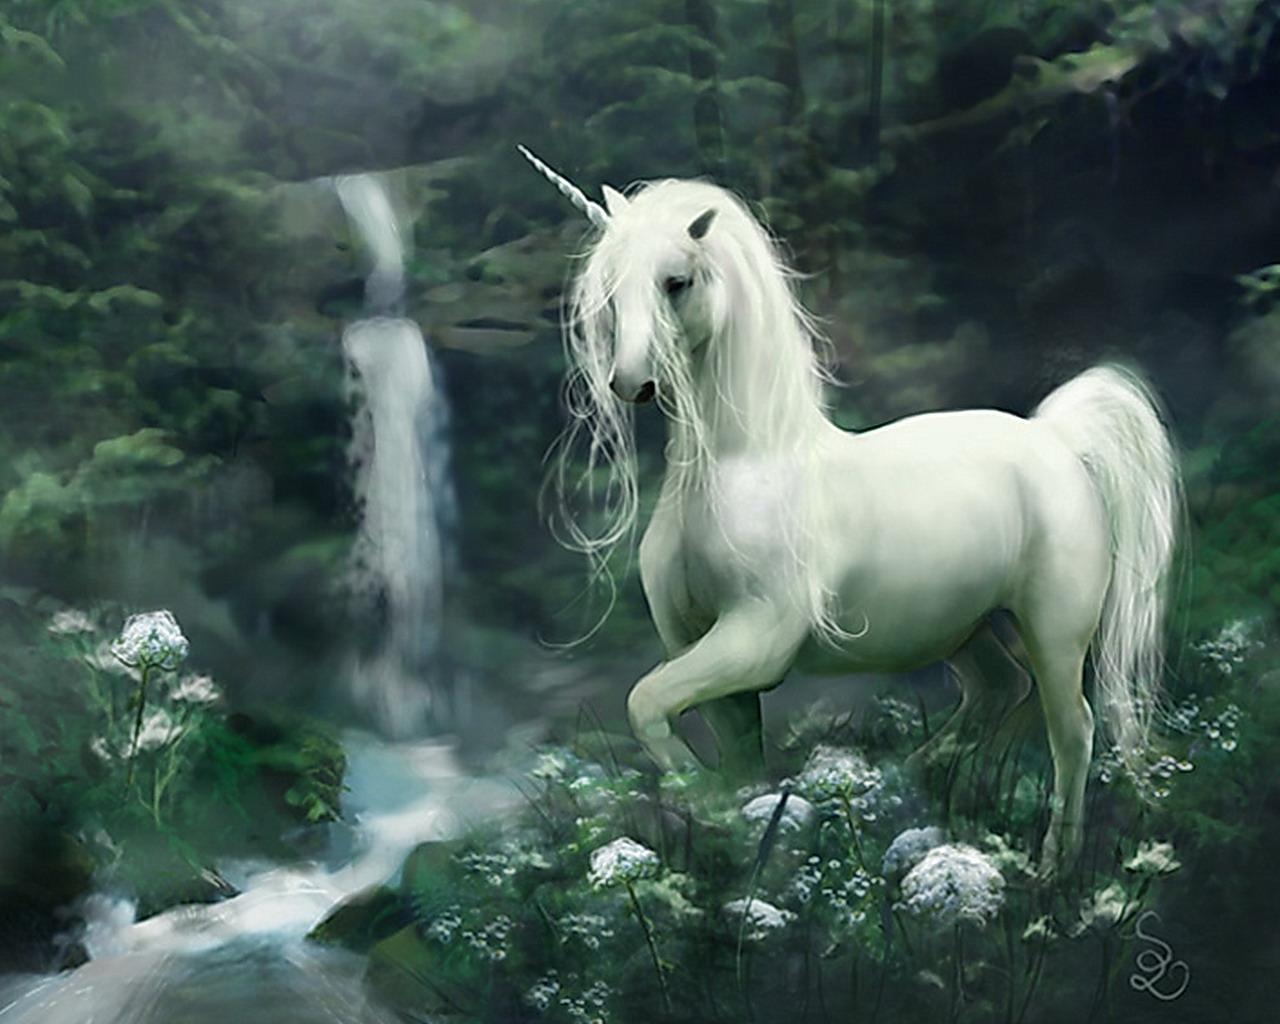 Unicorn   Fantasy Photo 30995379 1280x1024